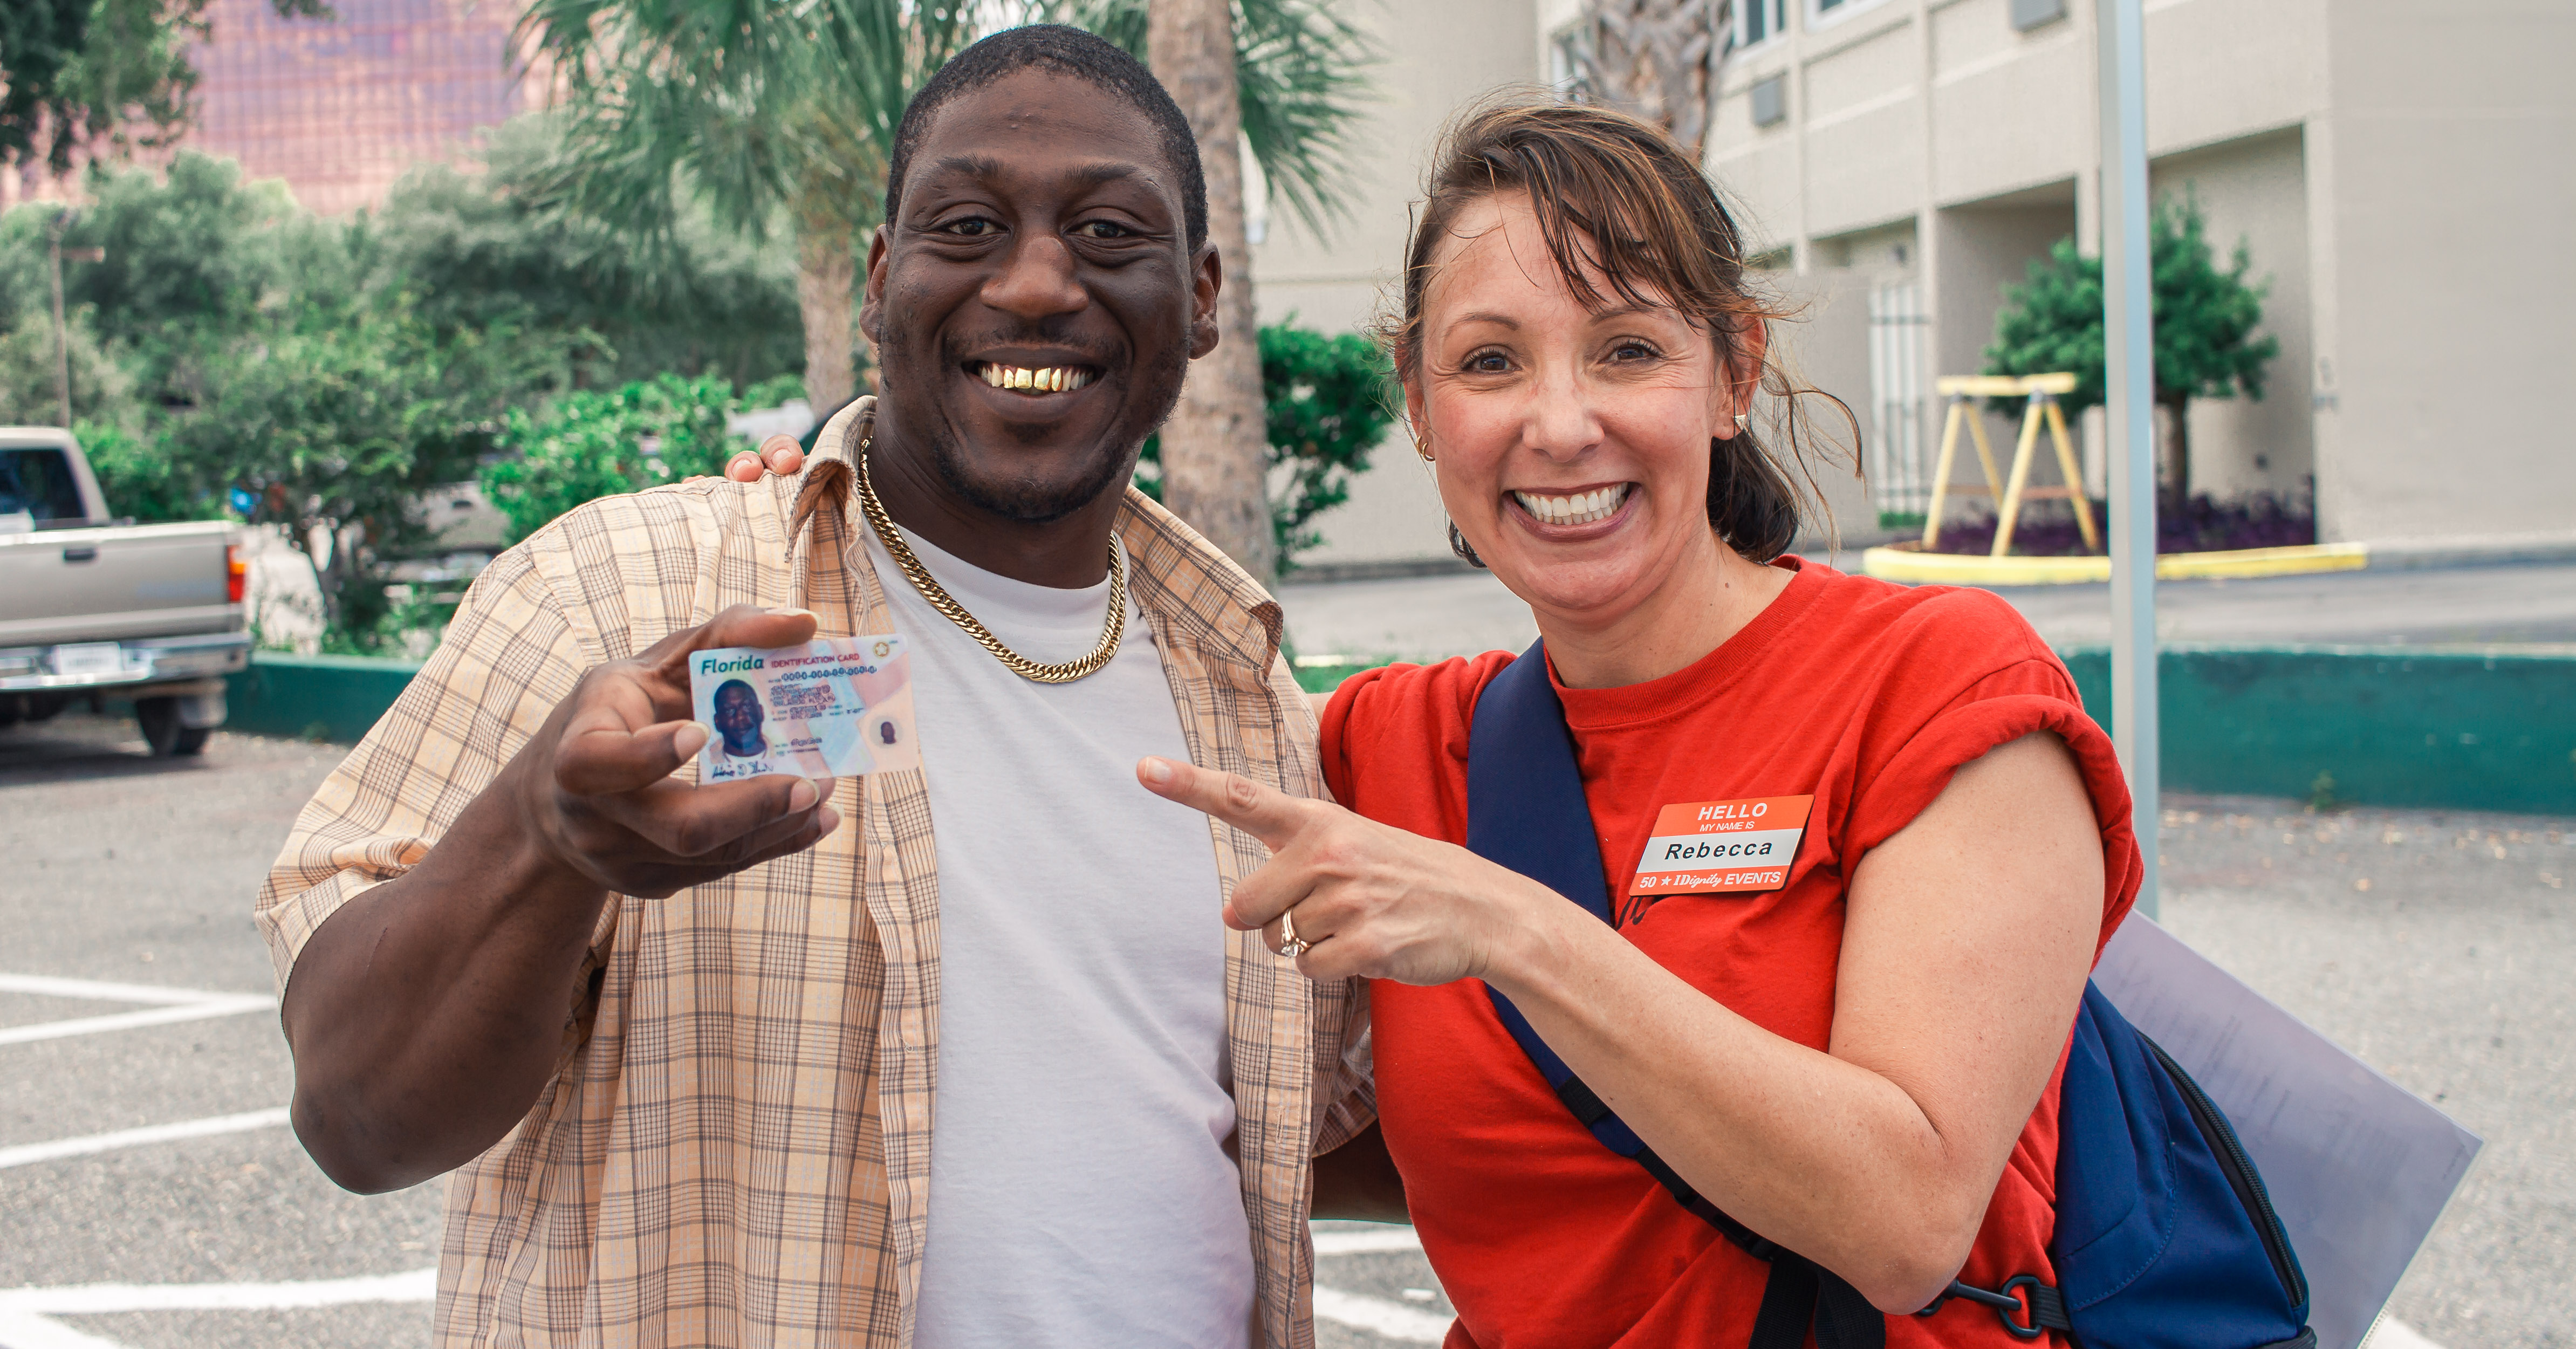 IDignity client celebrates his new ID